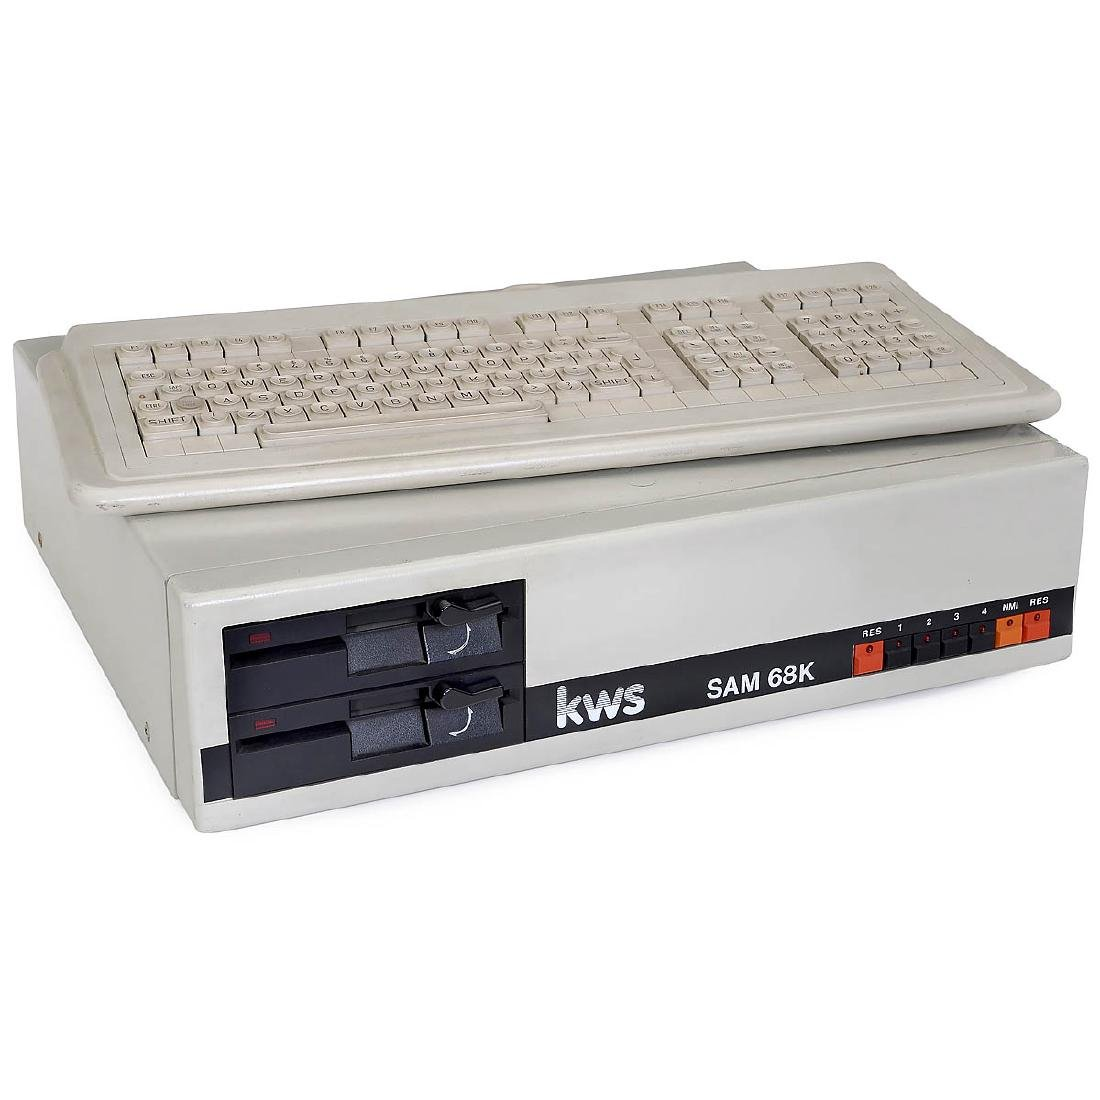 KWS SAM 68K Computer, 1983